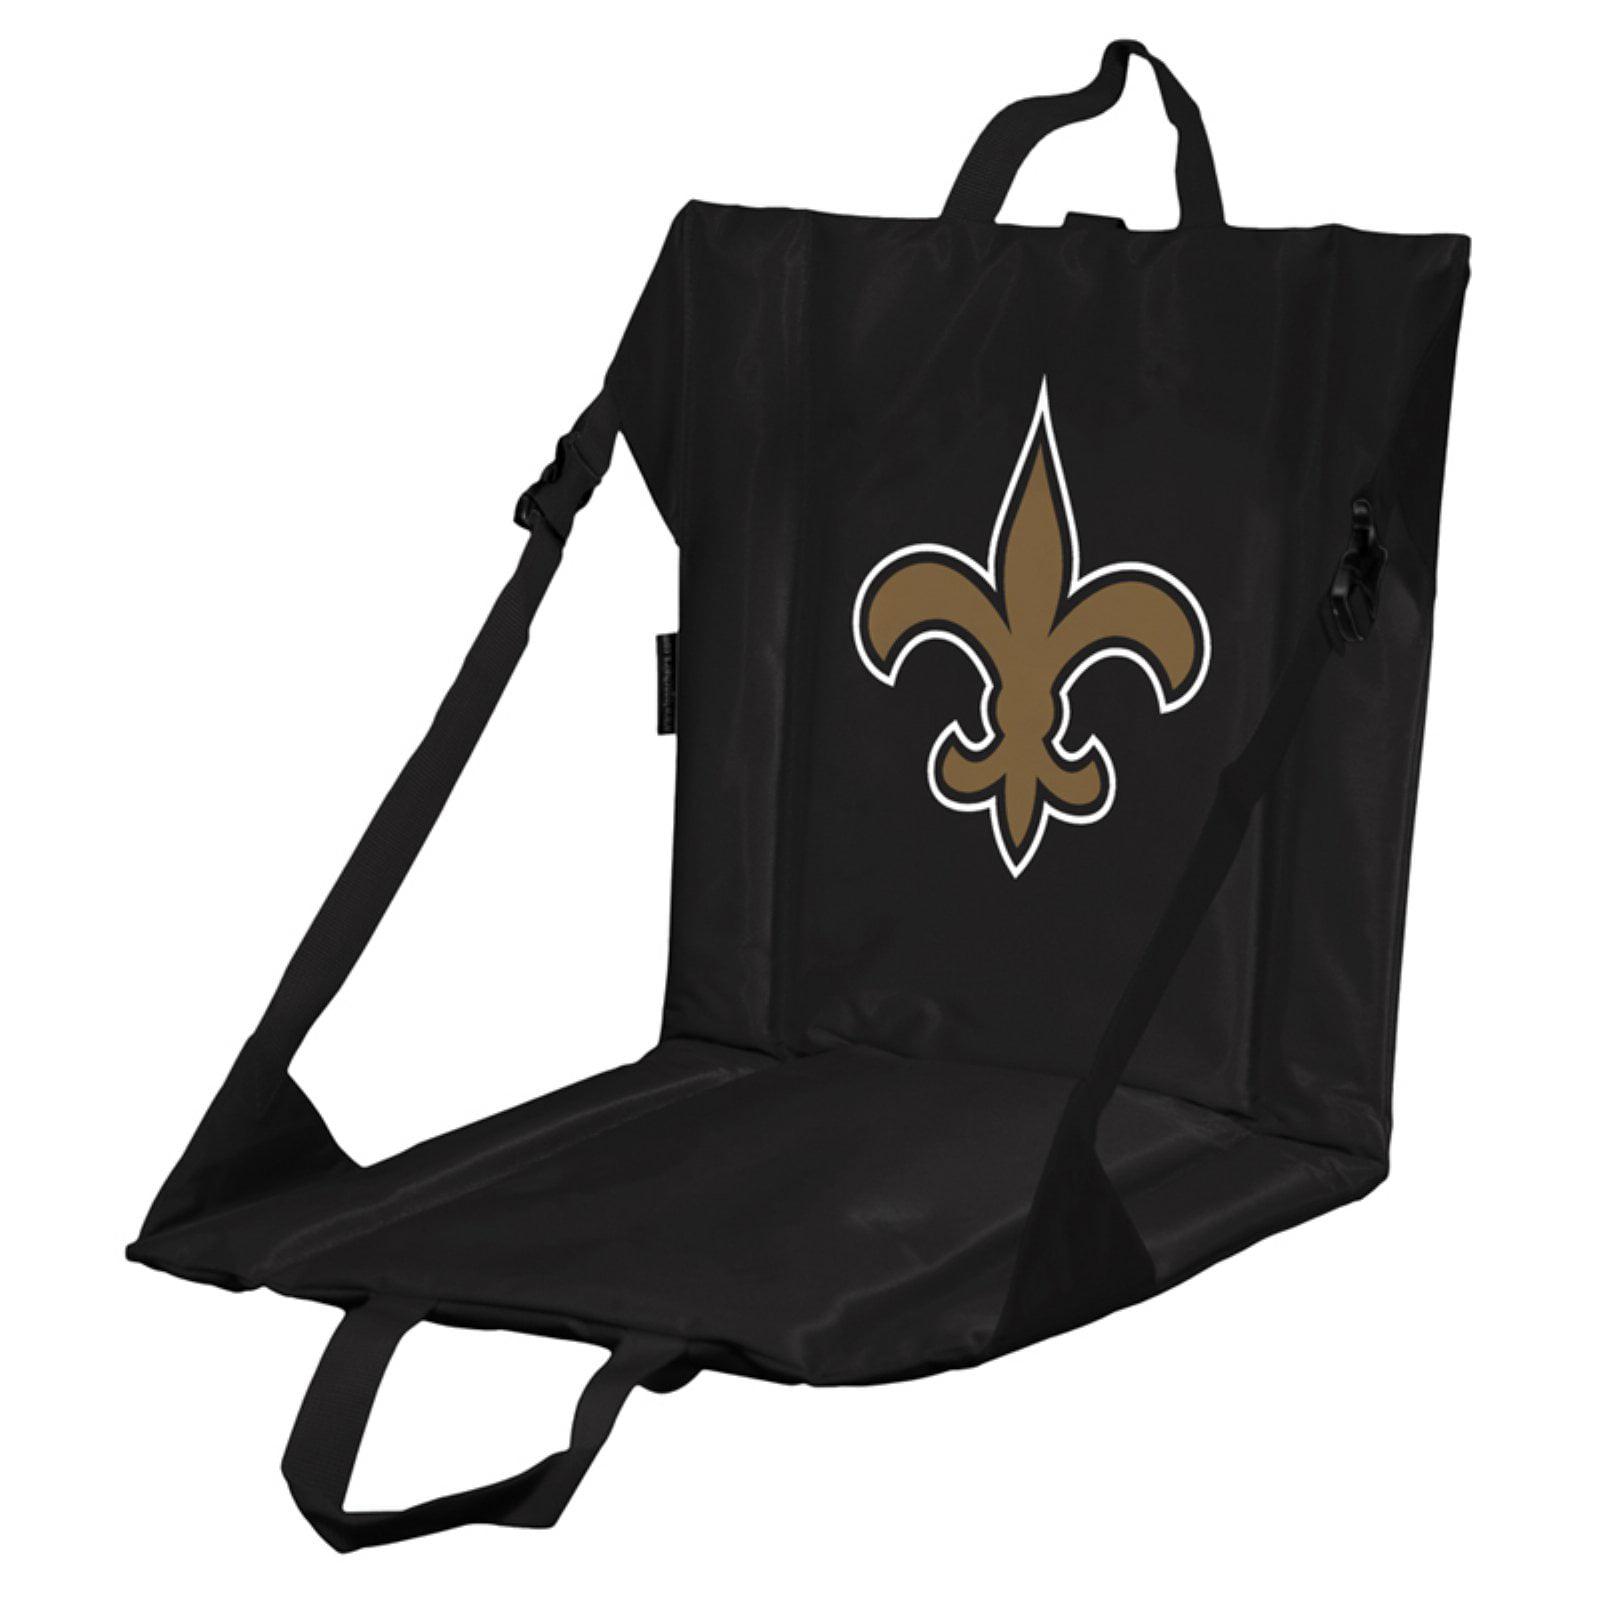 New Orleans Saints Stadium Seat